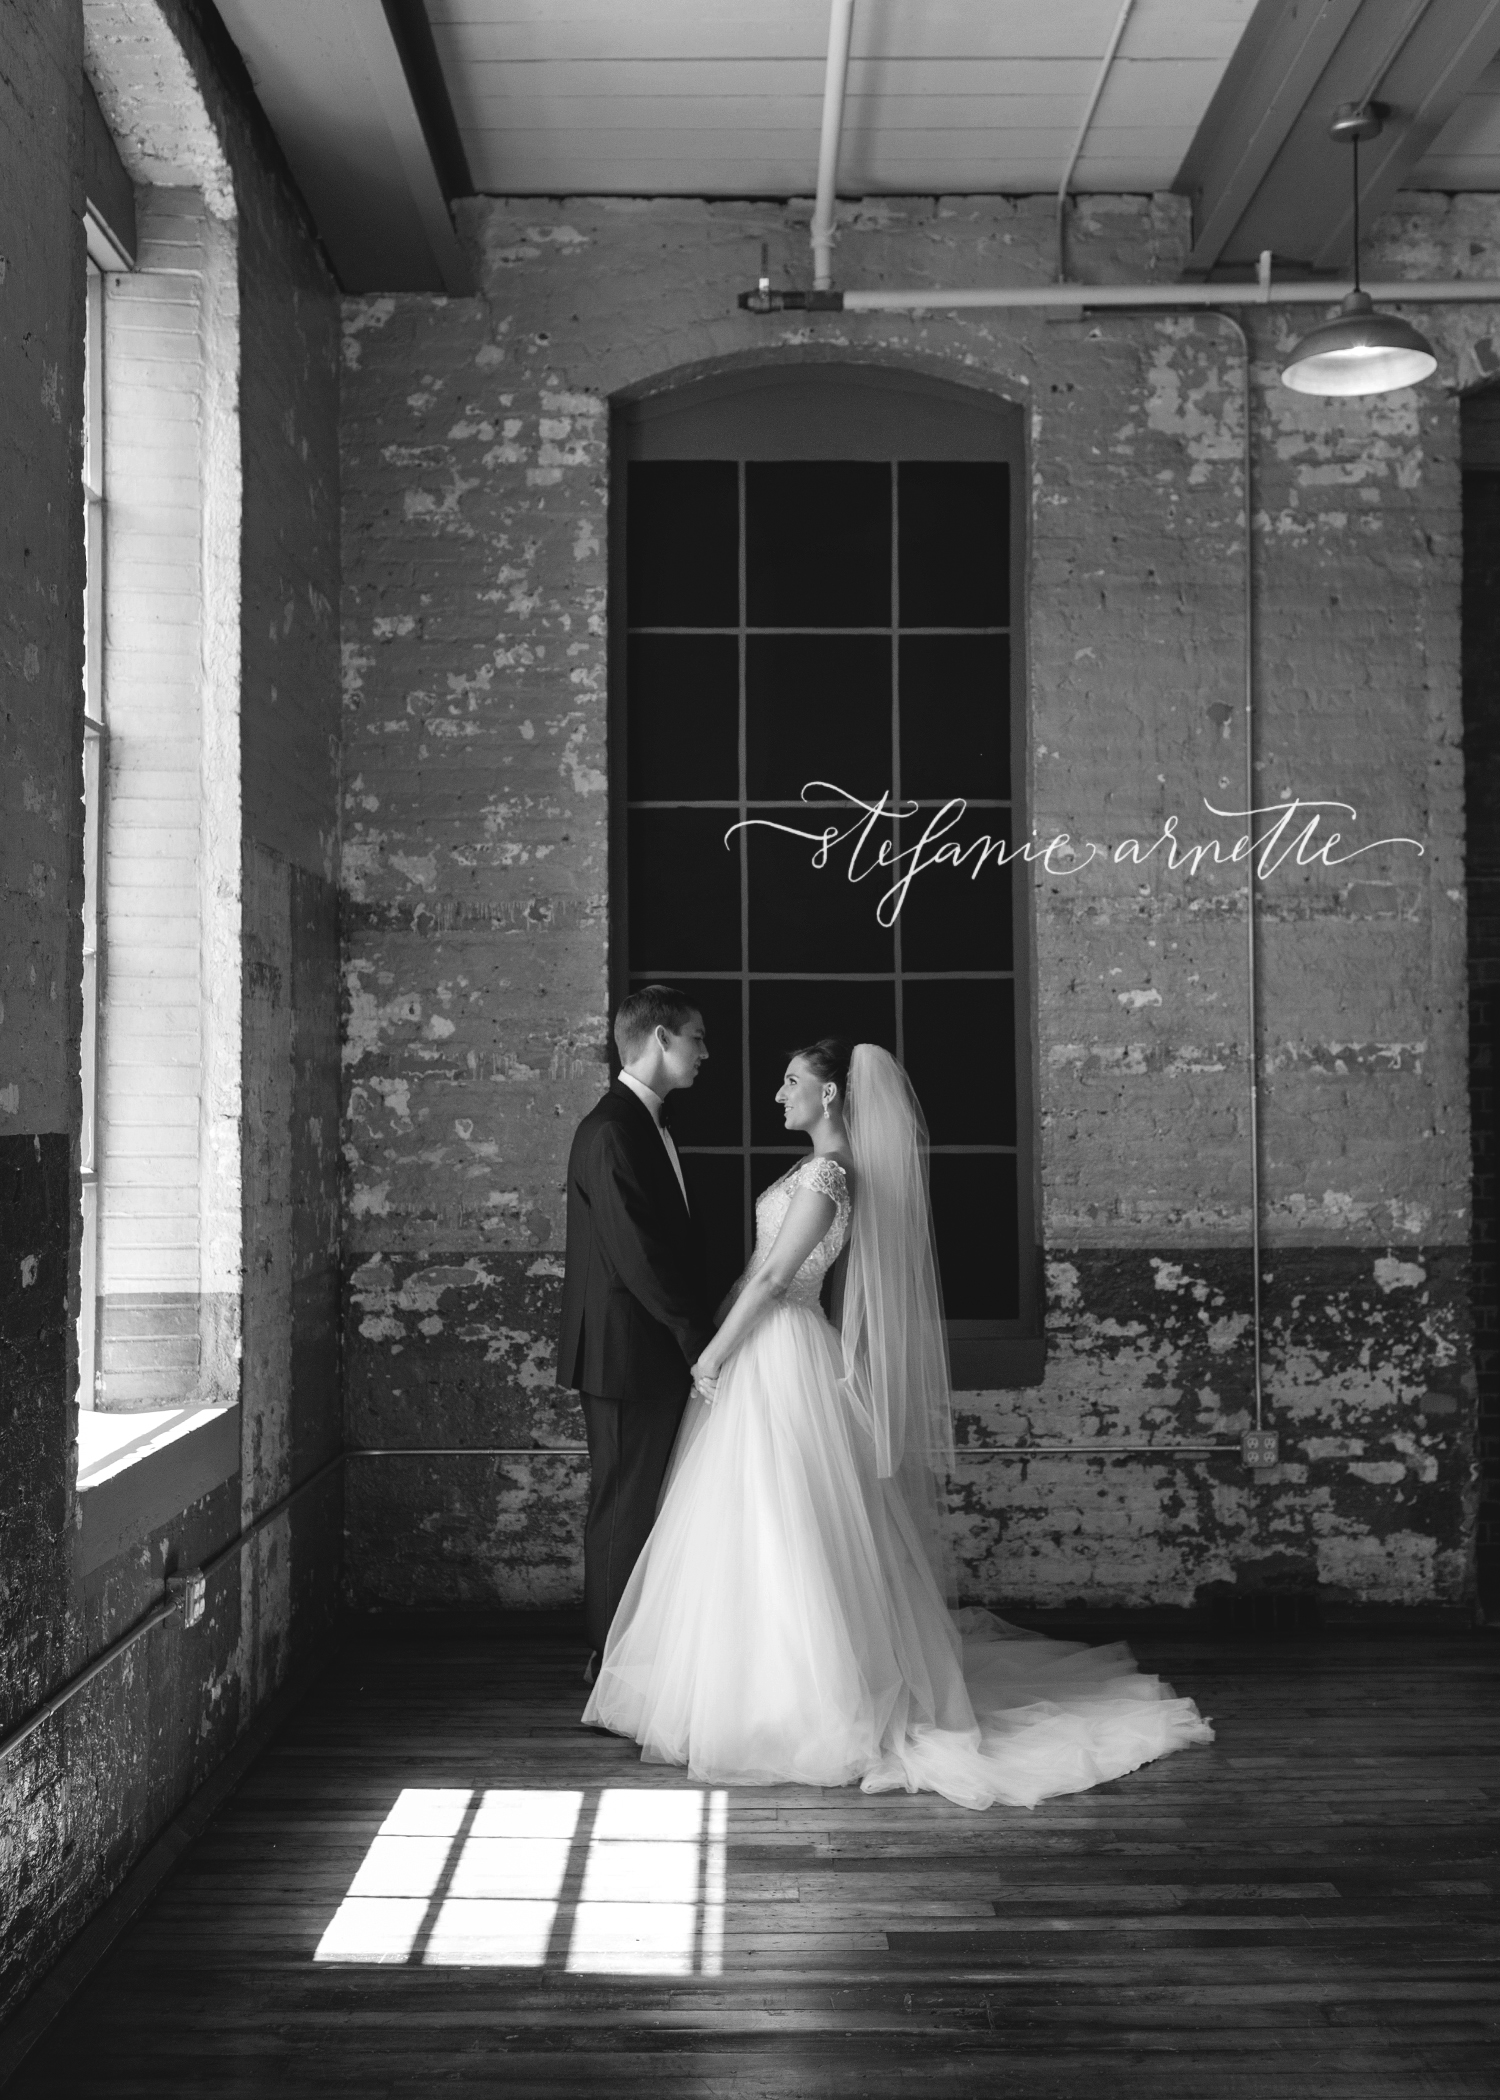 wedding-410bw.jpg